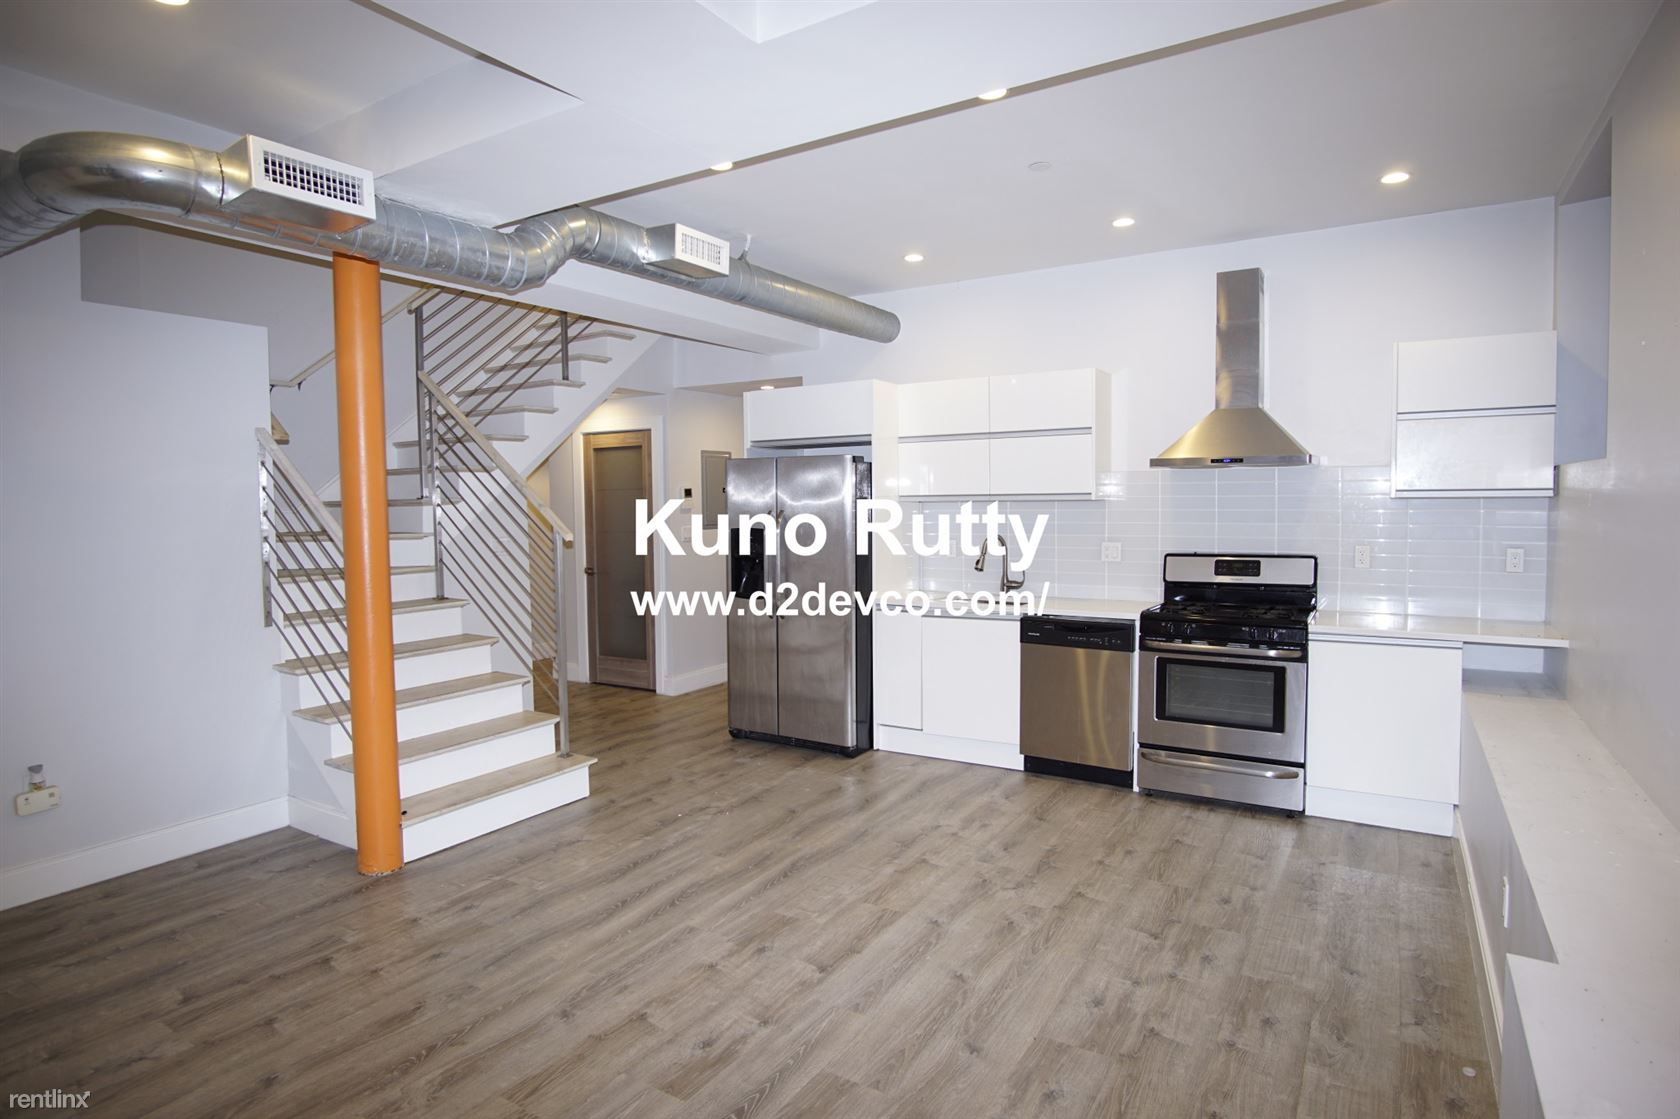 407 Dudley St Unit 1, Roxbury, MA - $3,600